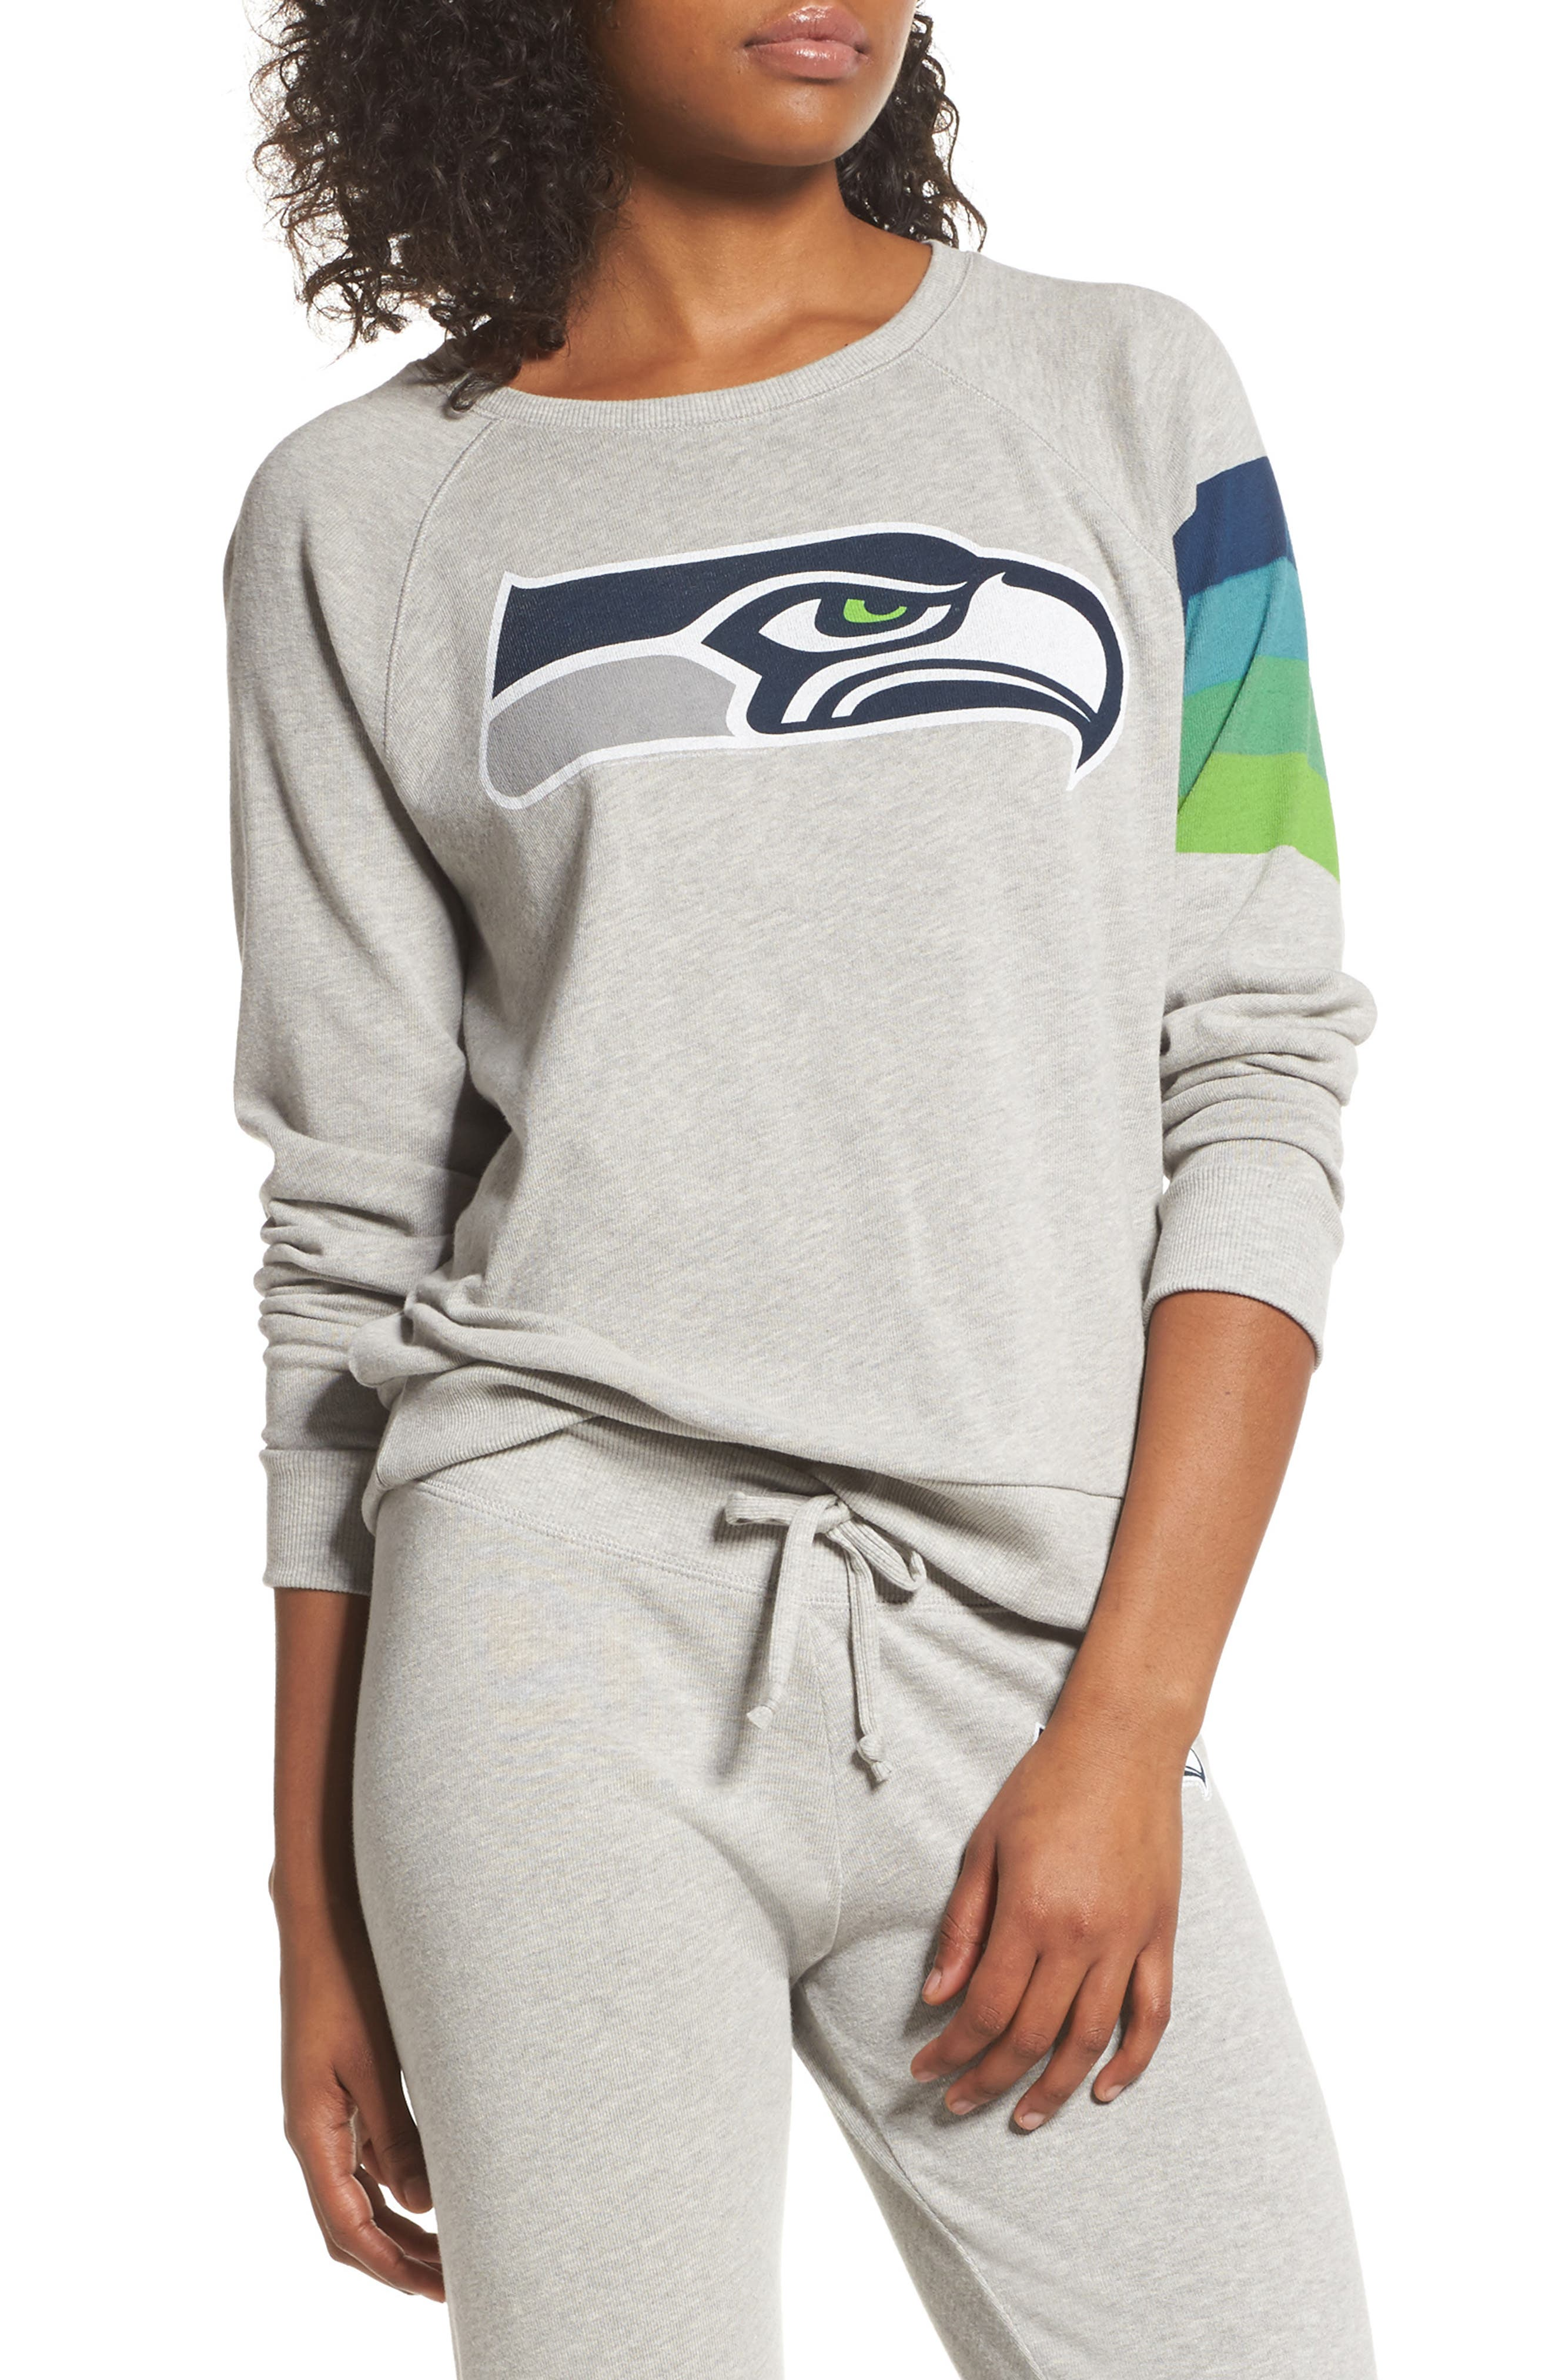 Main Image - Junk Food NFL Seattle Seahawks Hacci Sweatshirt (Nordstrom Exclusive)